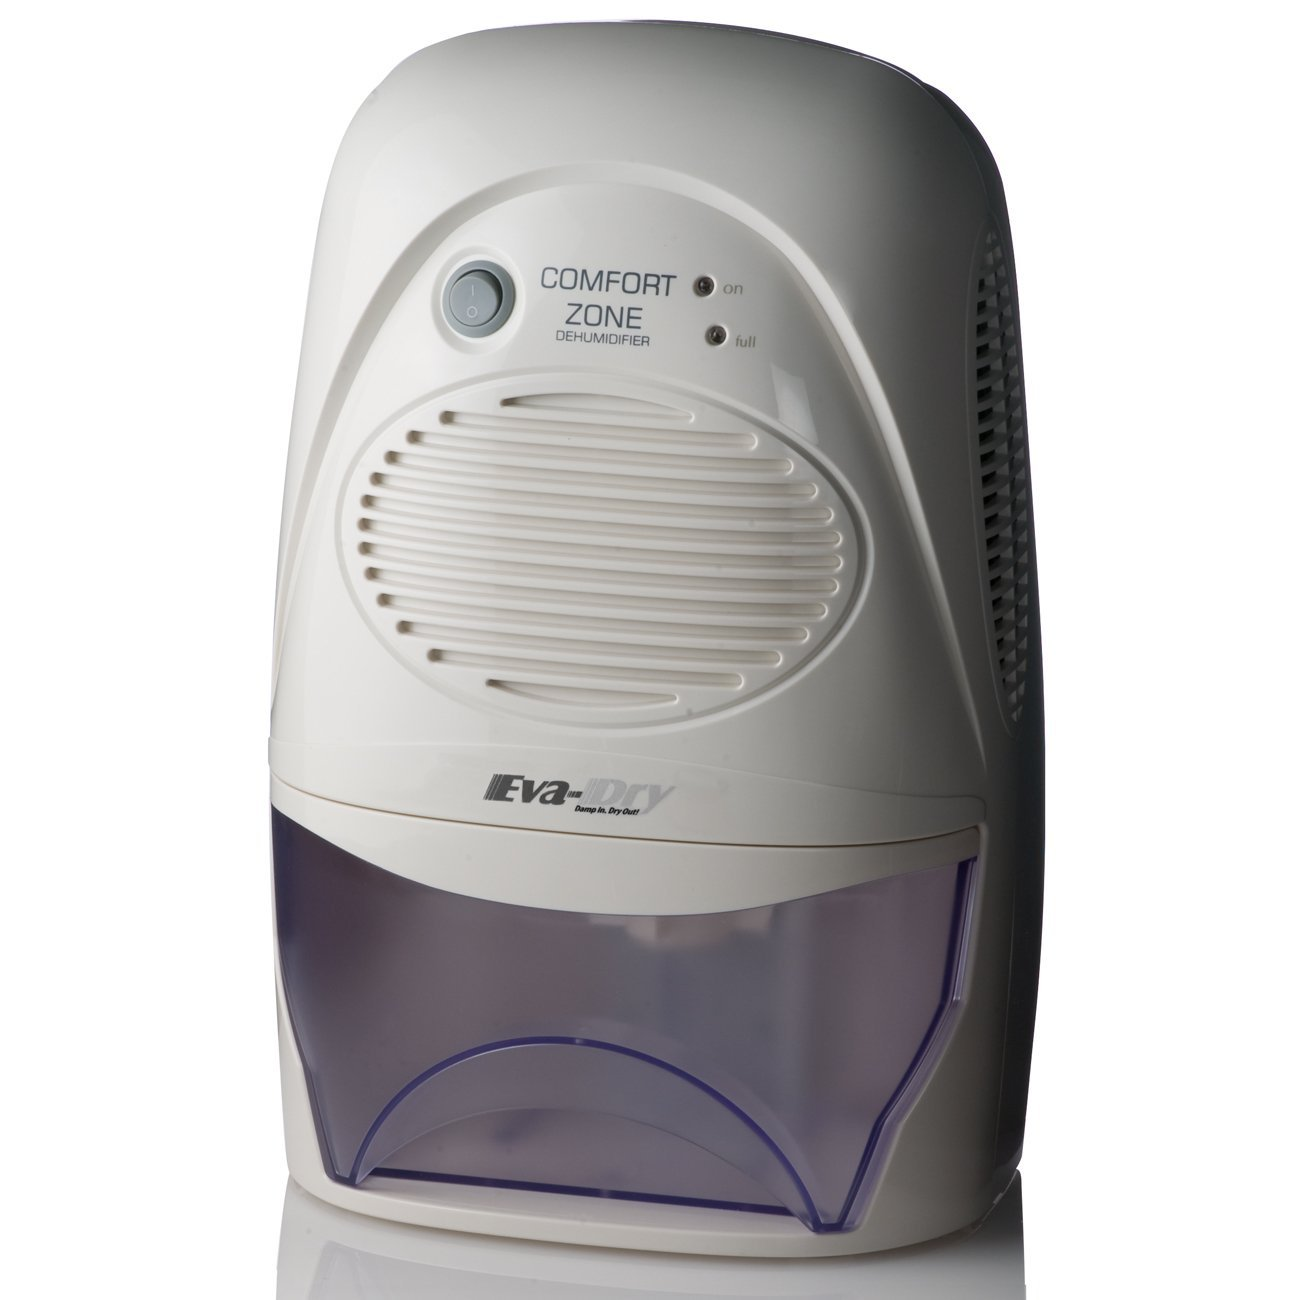 EVA DRY 2200 Electric Dehumidifier The Safe House Nashville TN #4A445B